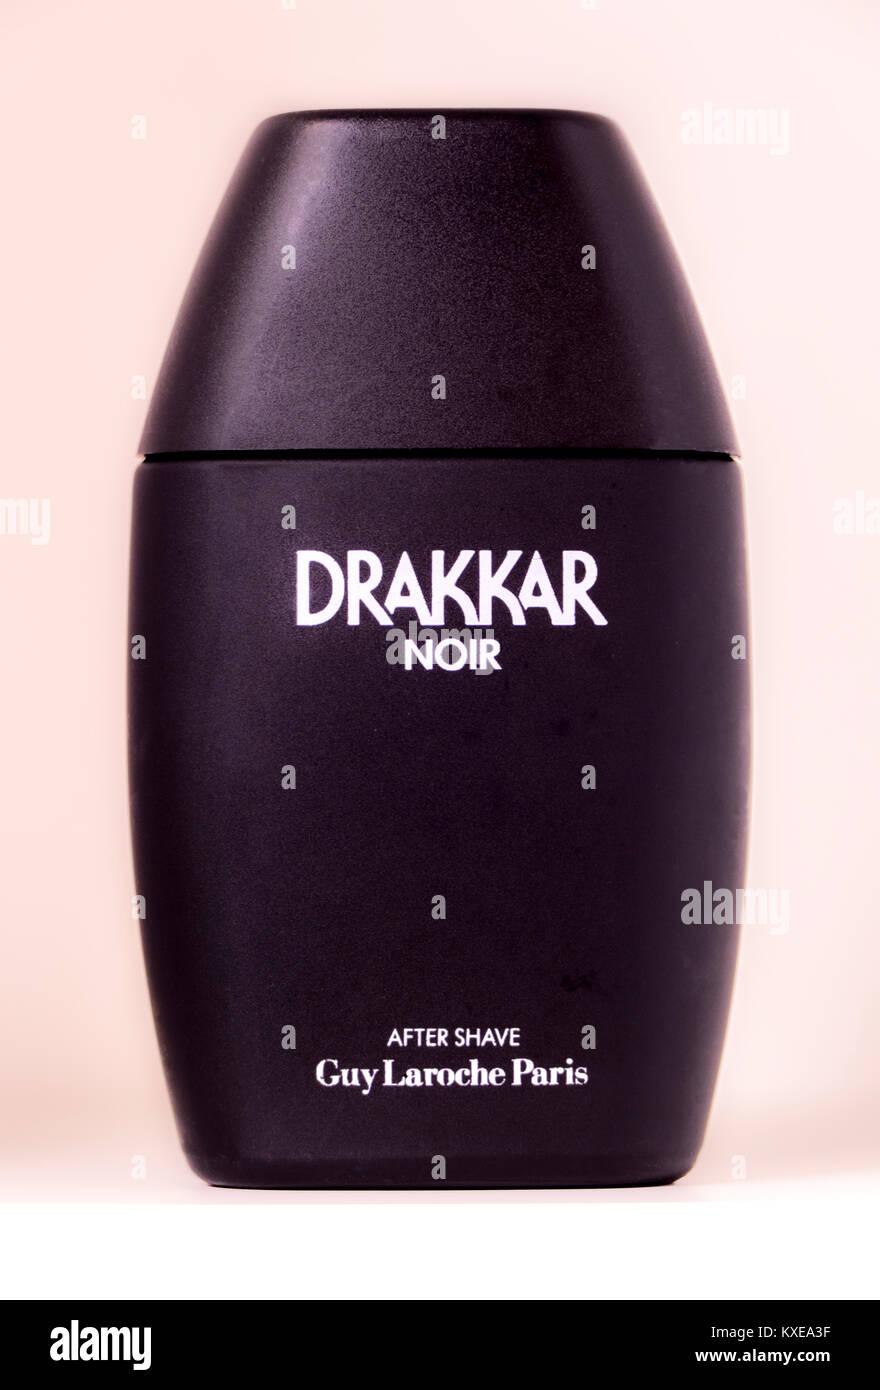 Drakkar Noir aftershave by Guy Laroche. Rare 1980s classic vintage, old alcohol, splash lotion, in black bottle - Stock Image